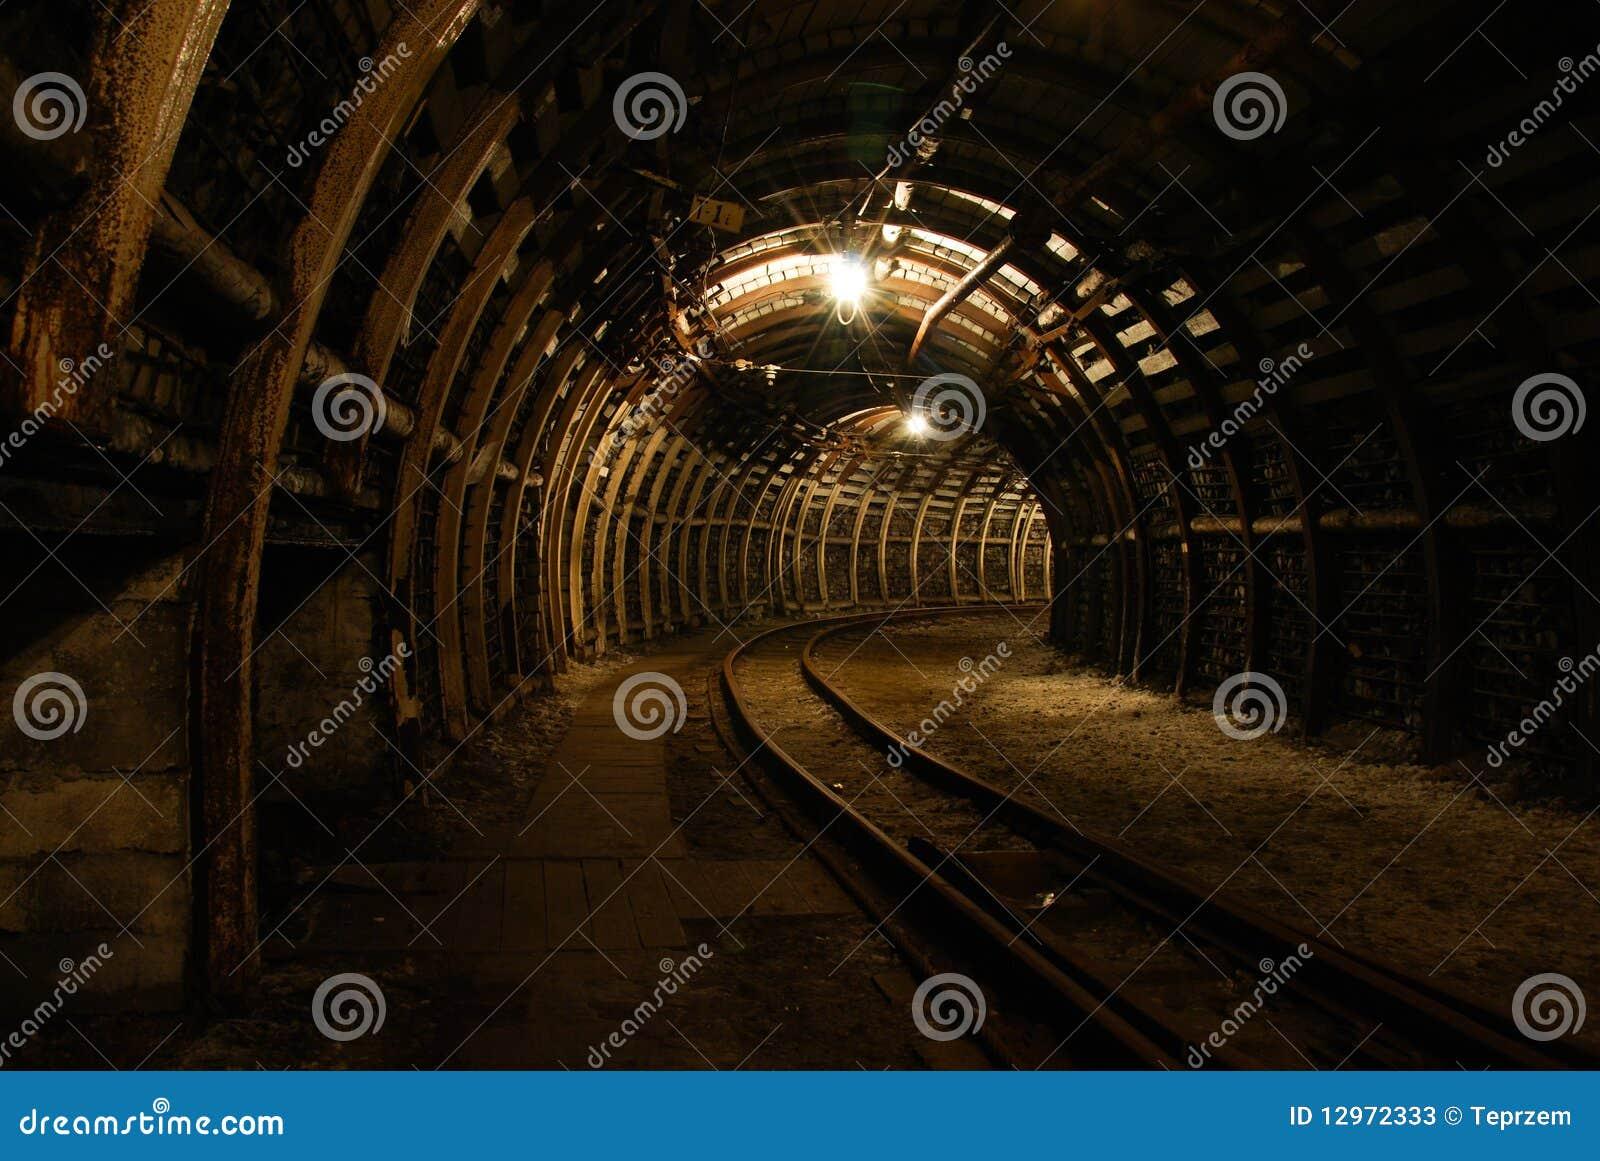 Modern Coal Mine Stock Photos - Image: 12972333